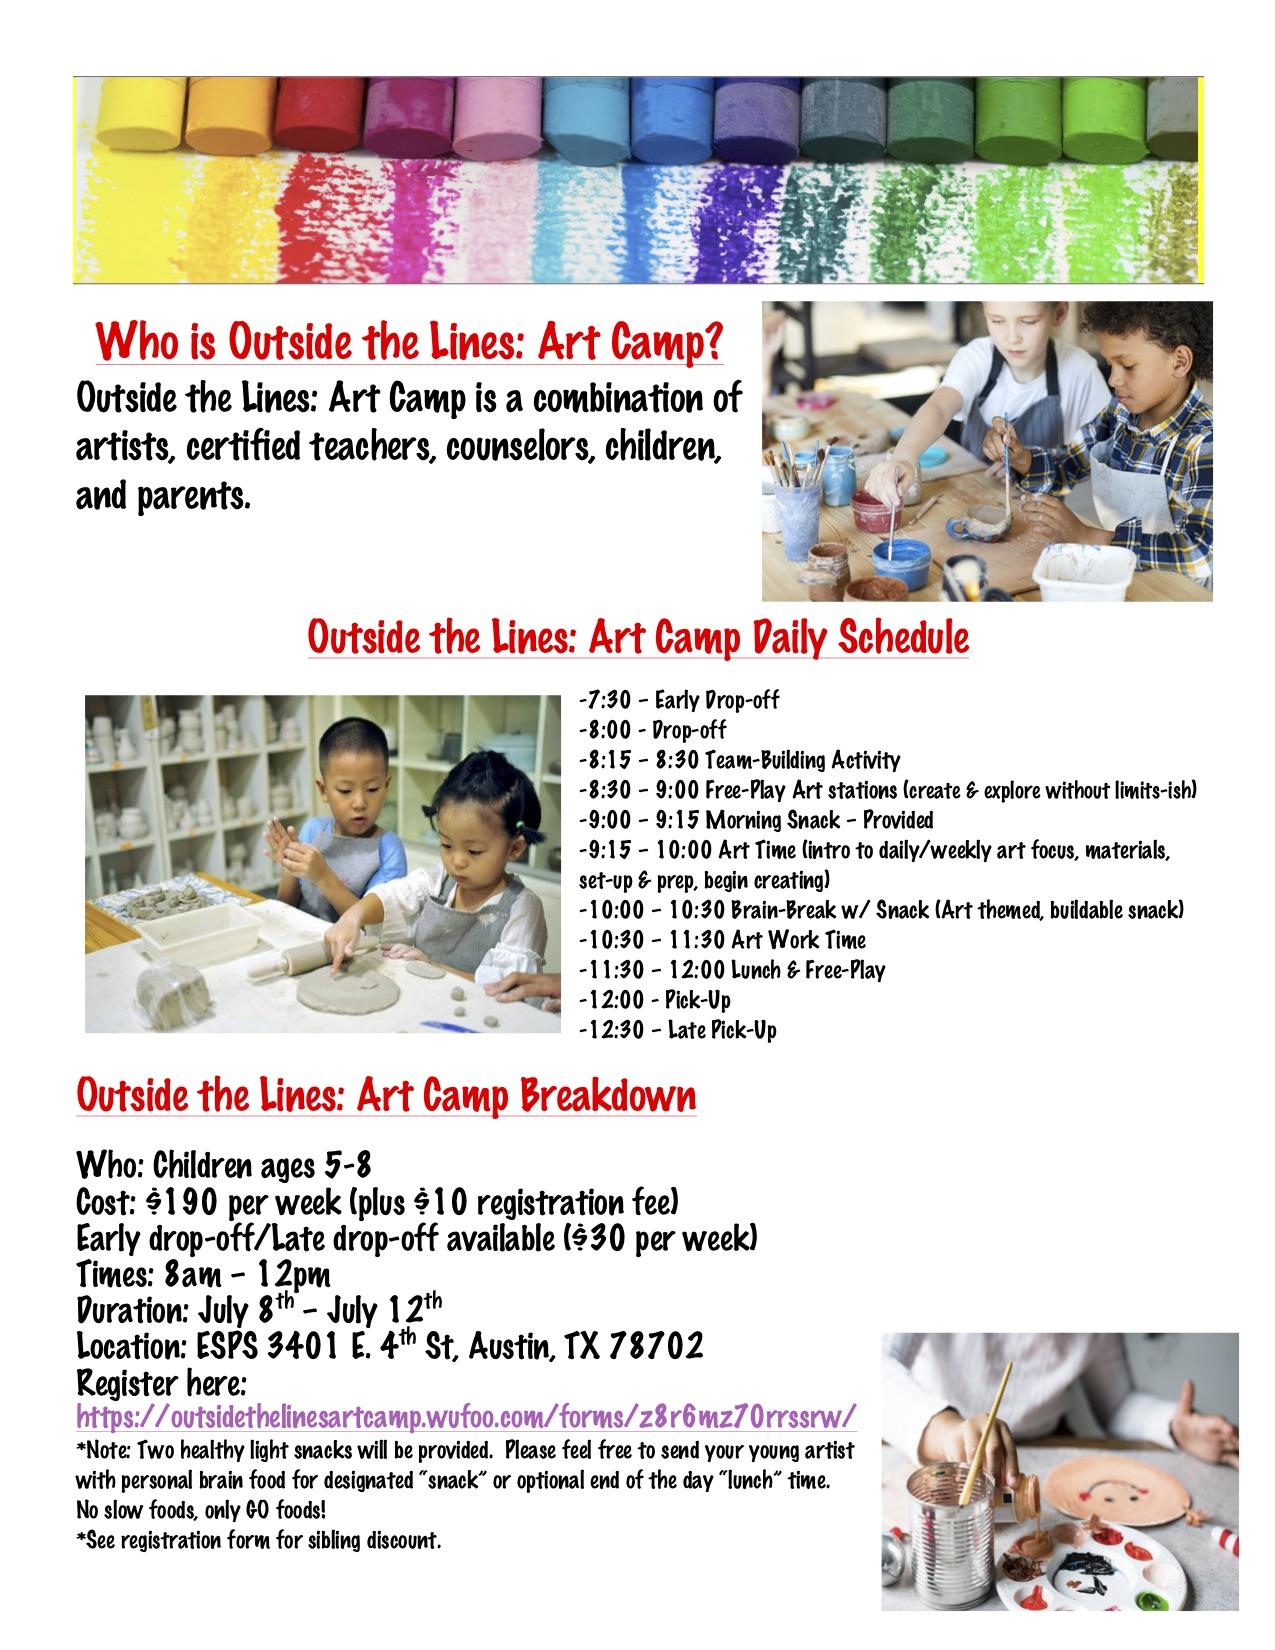 OTL Art Camp Brochure 2019 (dragged) 2.jpg